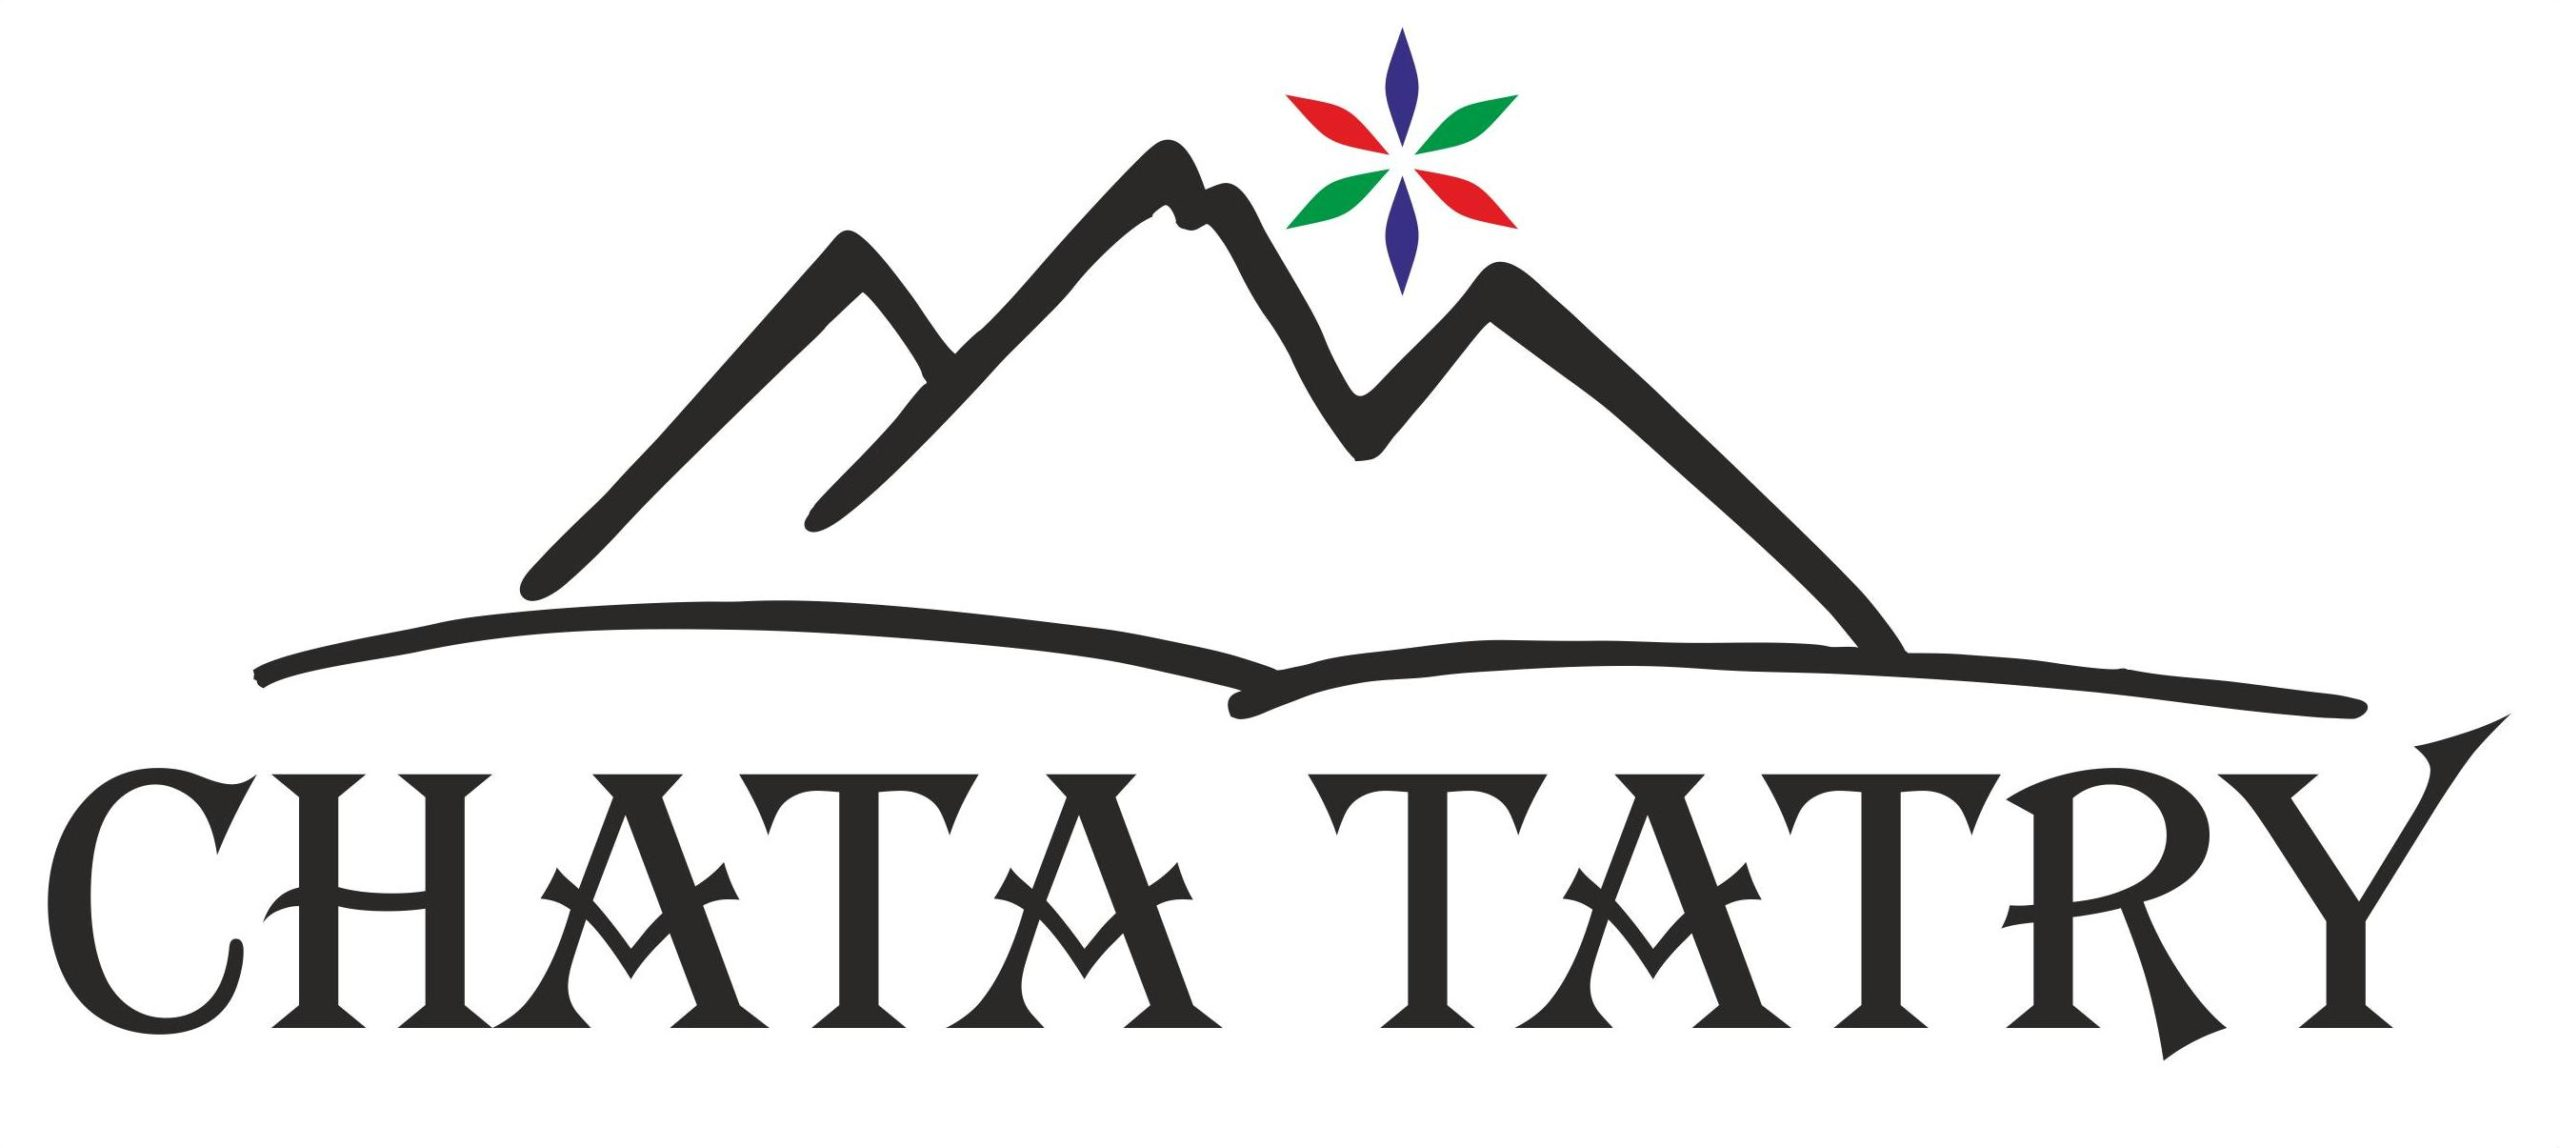 CHATA TATRY